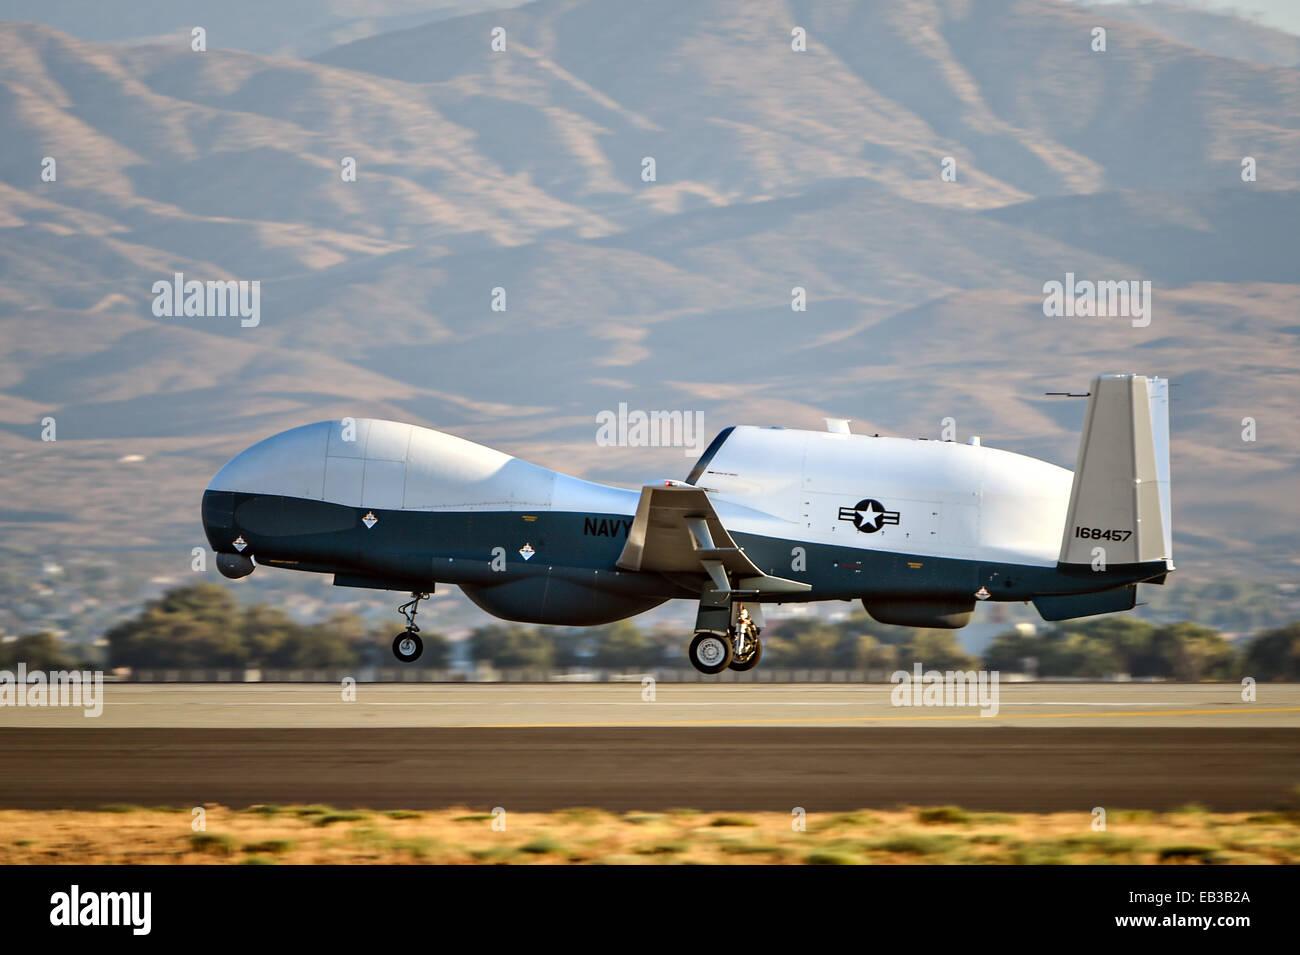 File:MQ-4C Tritons on ramp Palmdale May 2013.jpg